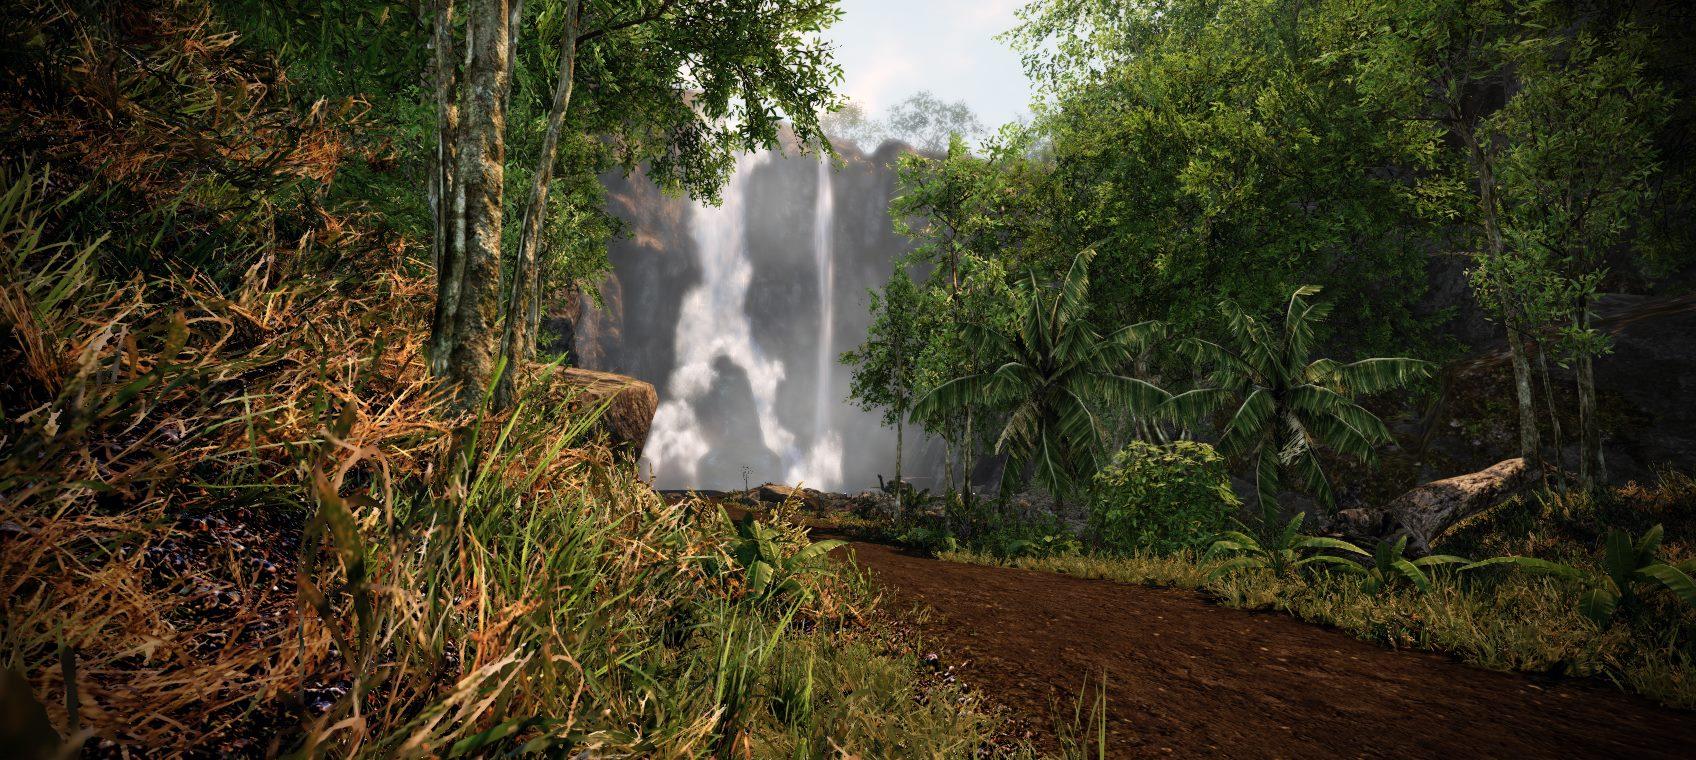 Obrazem: Jurassic Park: Aftermath 103993